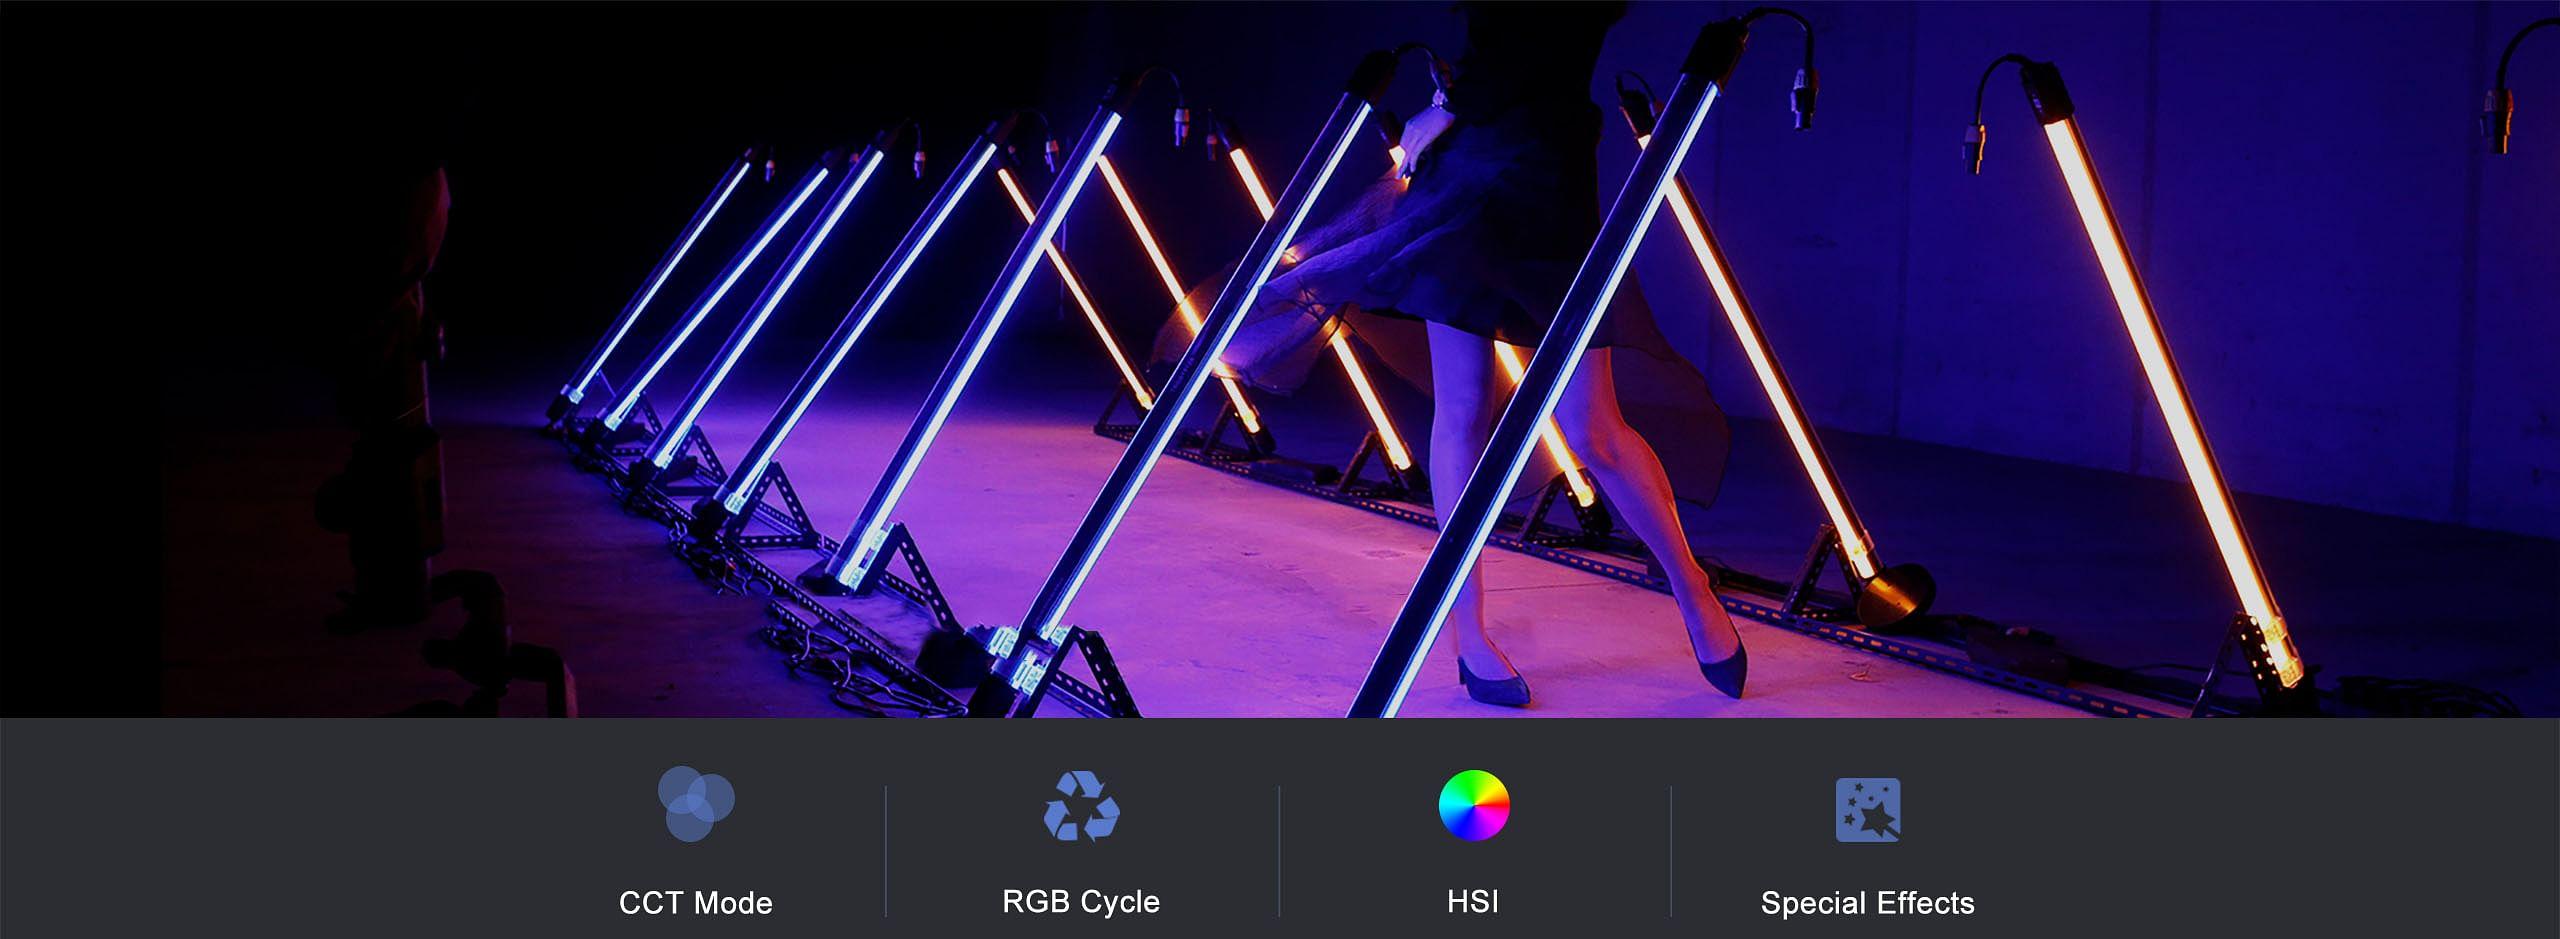 NANLITE PavoTube 30C RGBWW trubicové LED svetlo